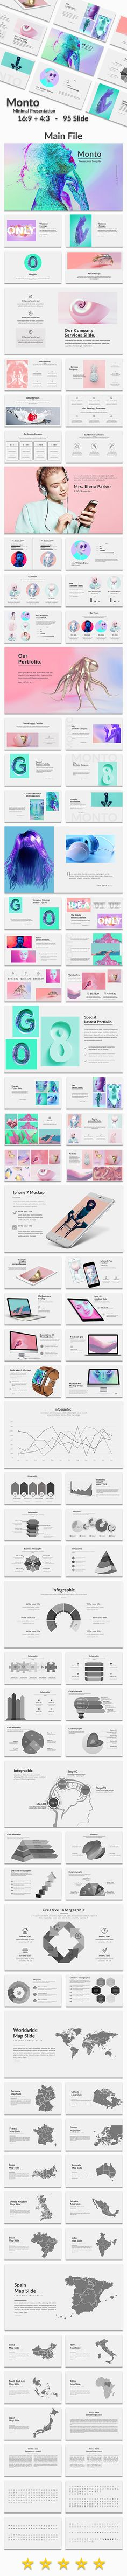 memphis powerpoint templatedublin_design on @creativemarket, University Of Memphis Presentation Template, Presentation templates